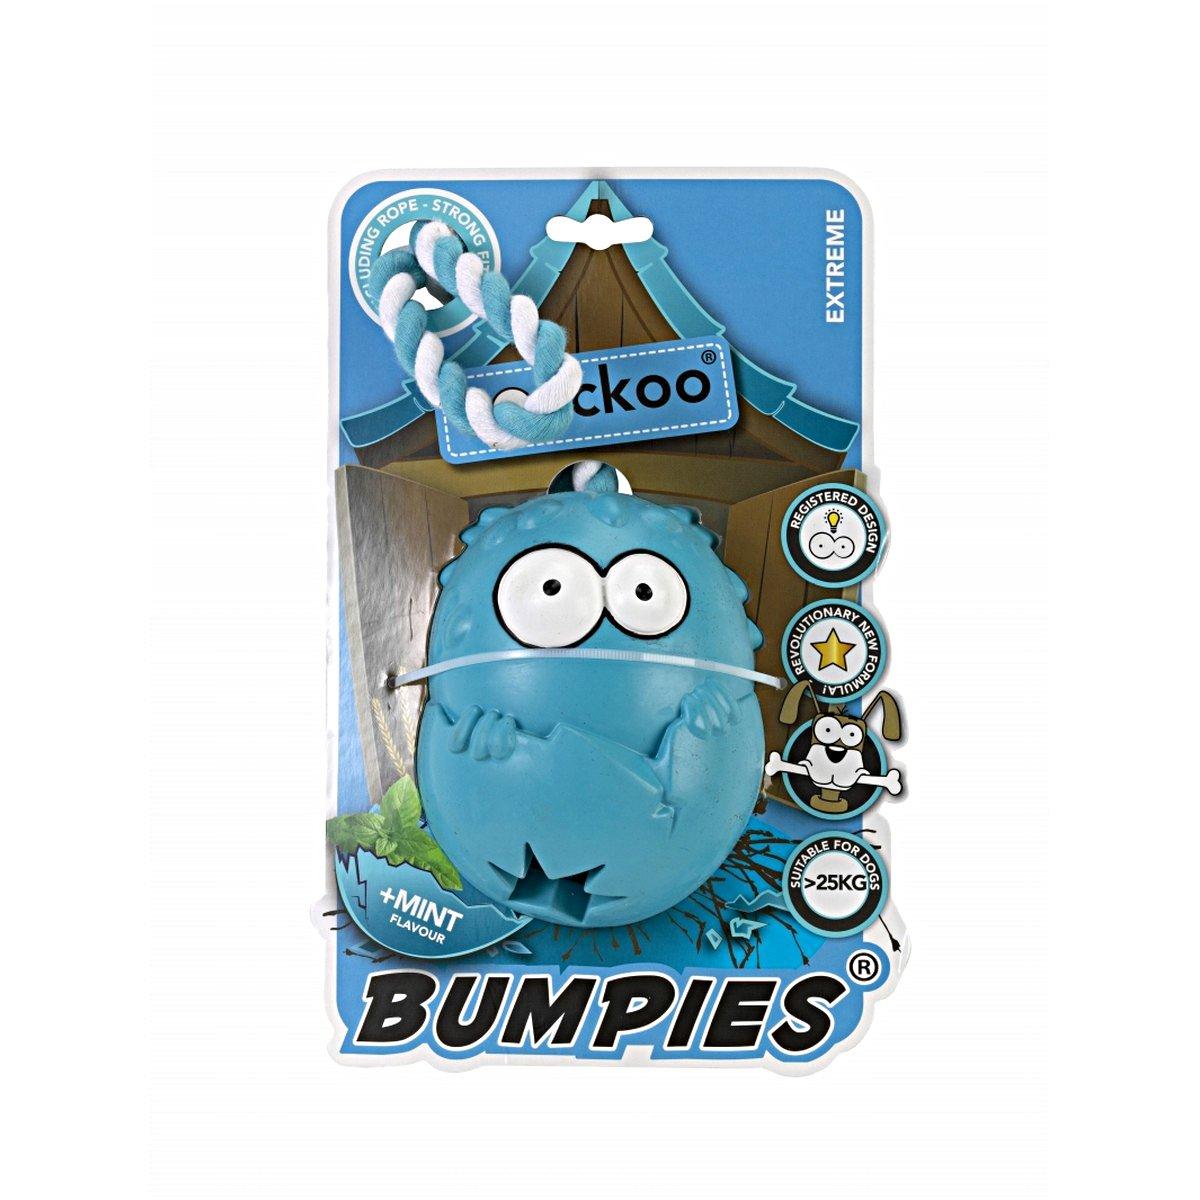 Afbeelding van Coockoo Bumpies With Rope Caribbean Blue Blauw 11x8,7x7,5cm